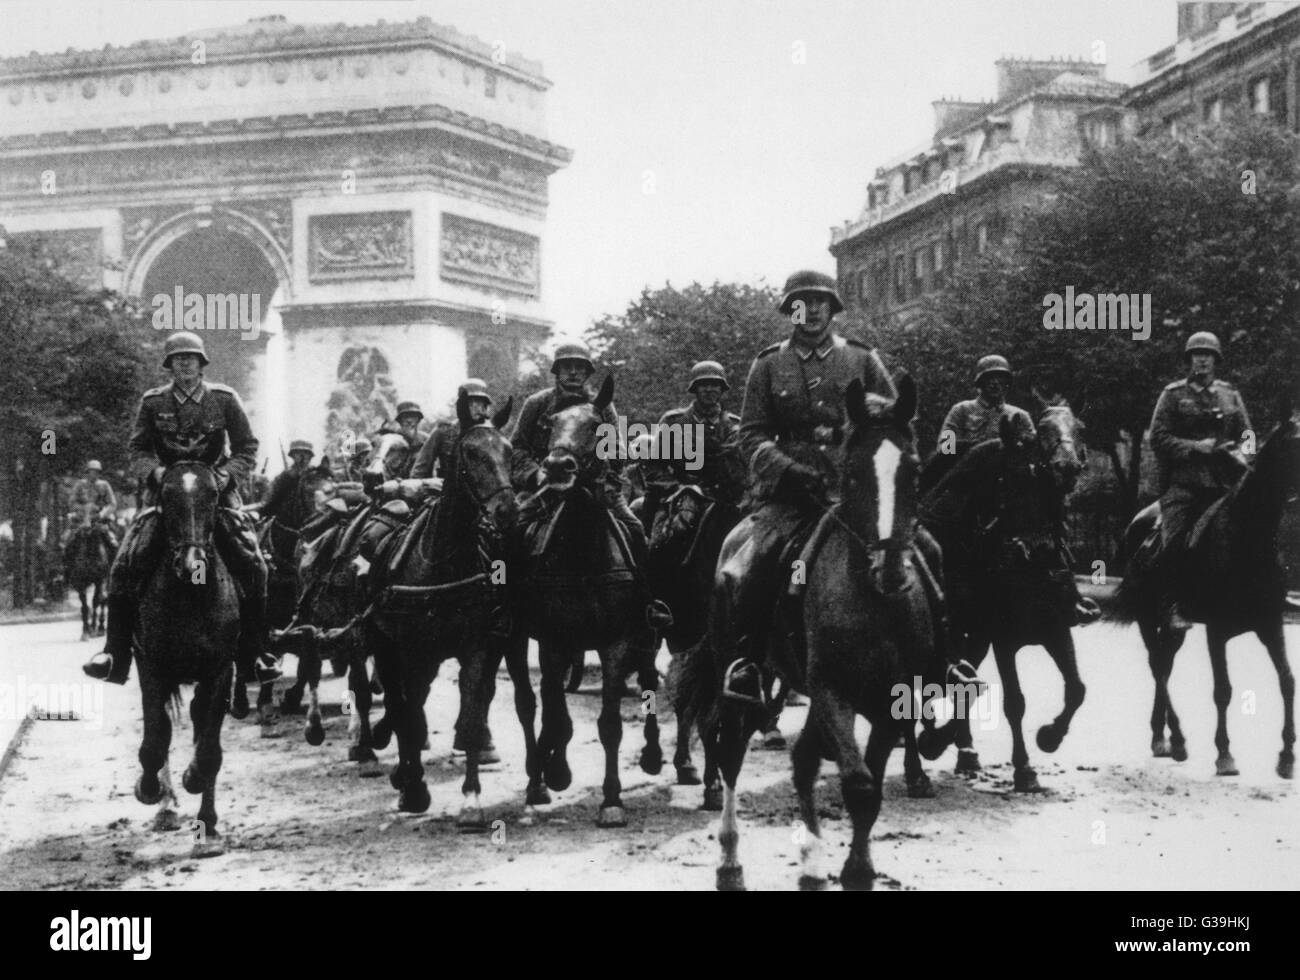 German troops enter Paris.         Date: 1940 - Stock Image